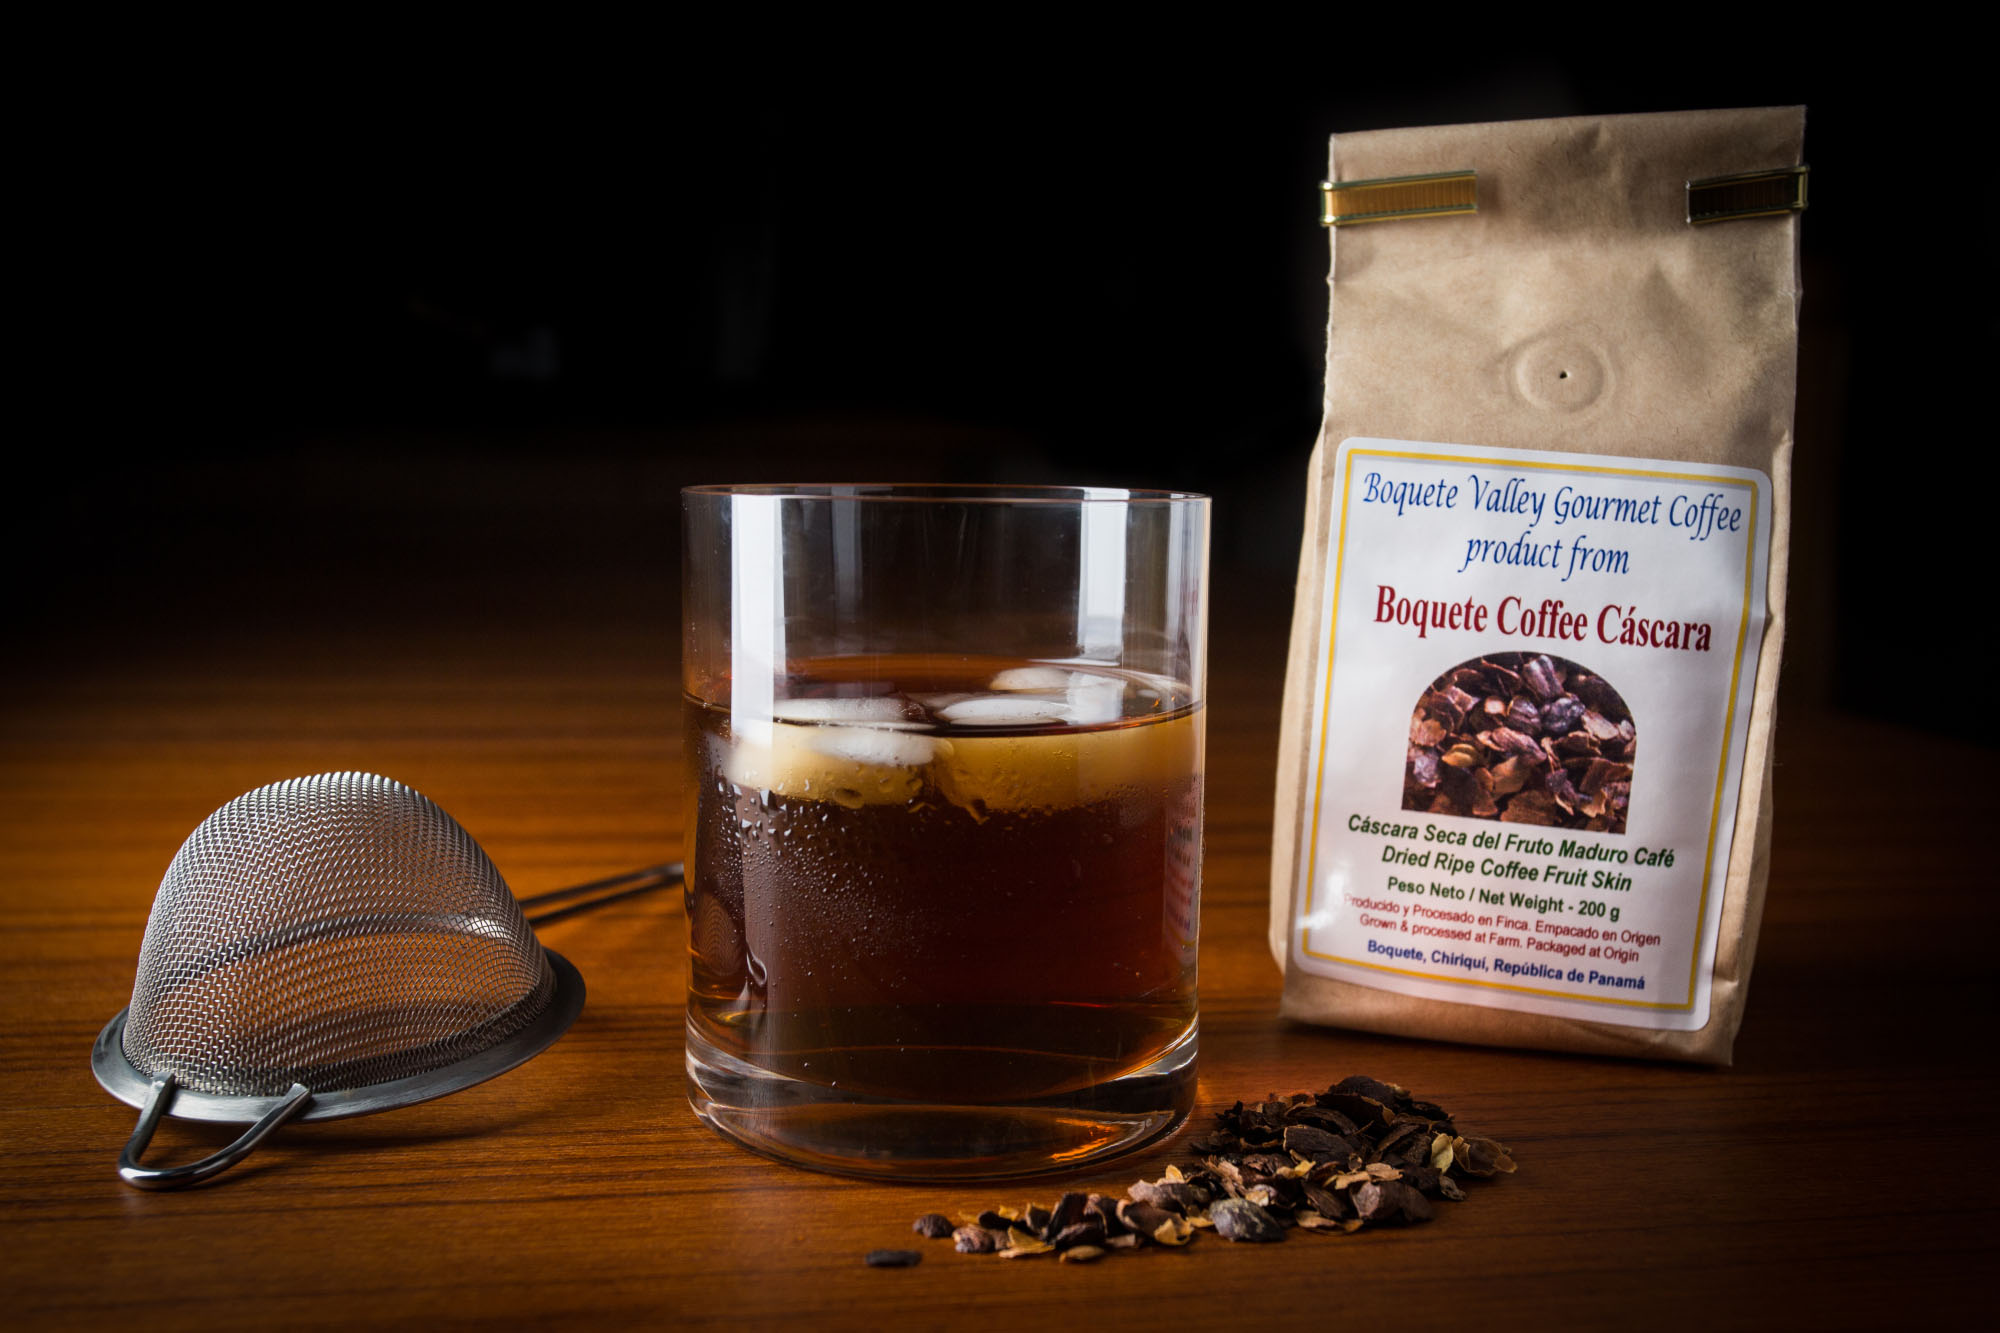 Boquete Coffee Cascara